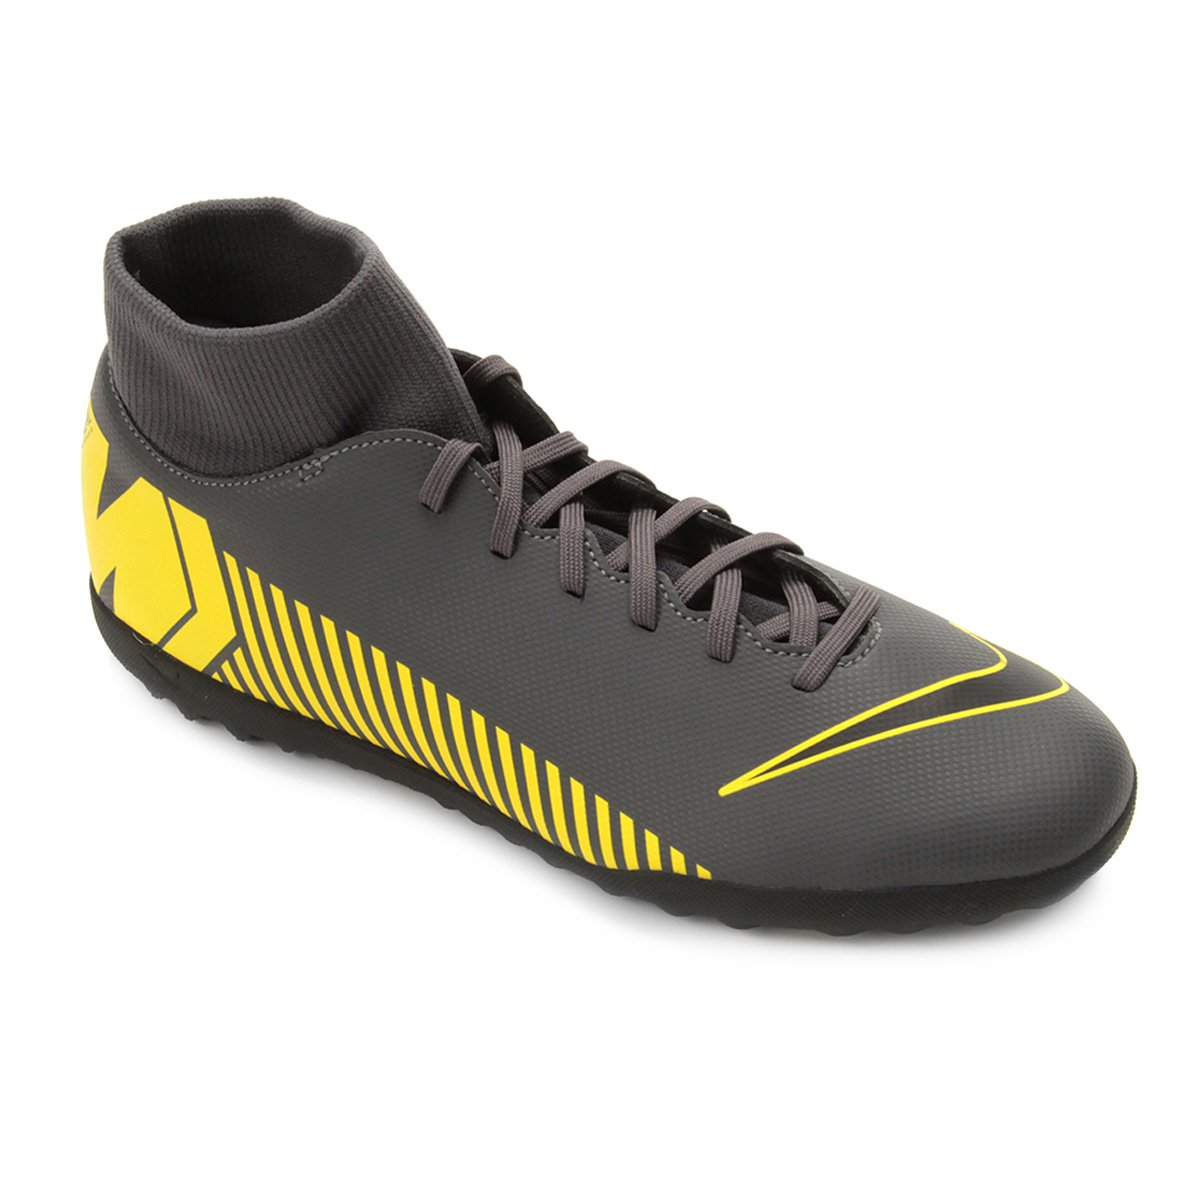 Chuteira Society Nike Superfly 6 Club TF - Cinza e Amarelo - Compre ... 29a3b12c8d7bc